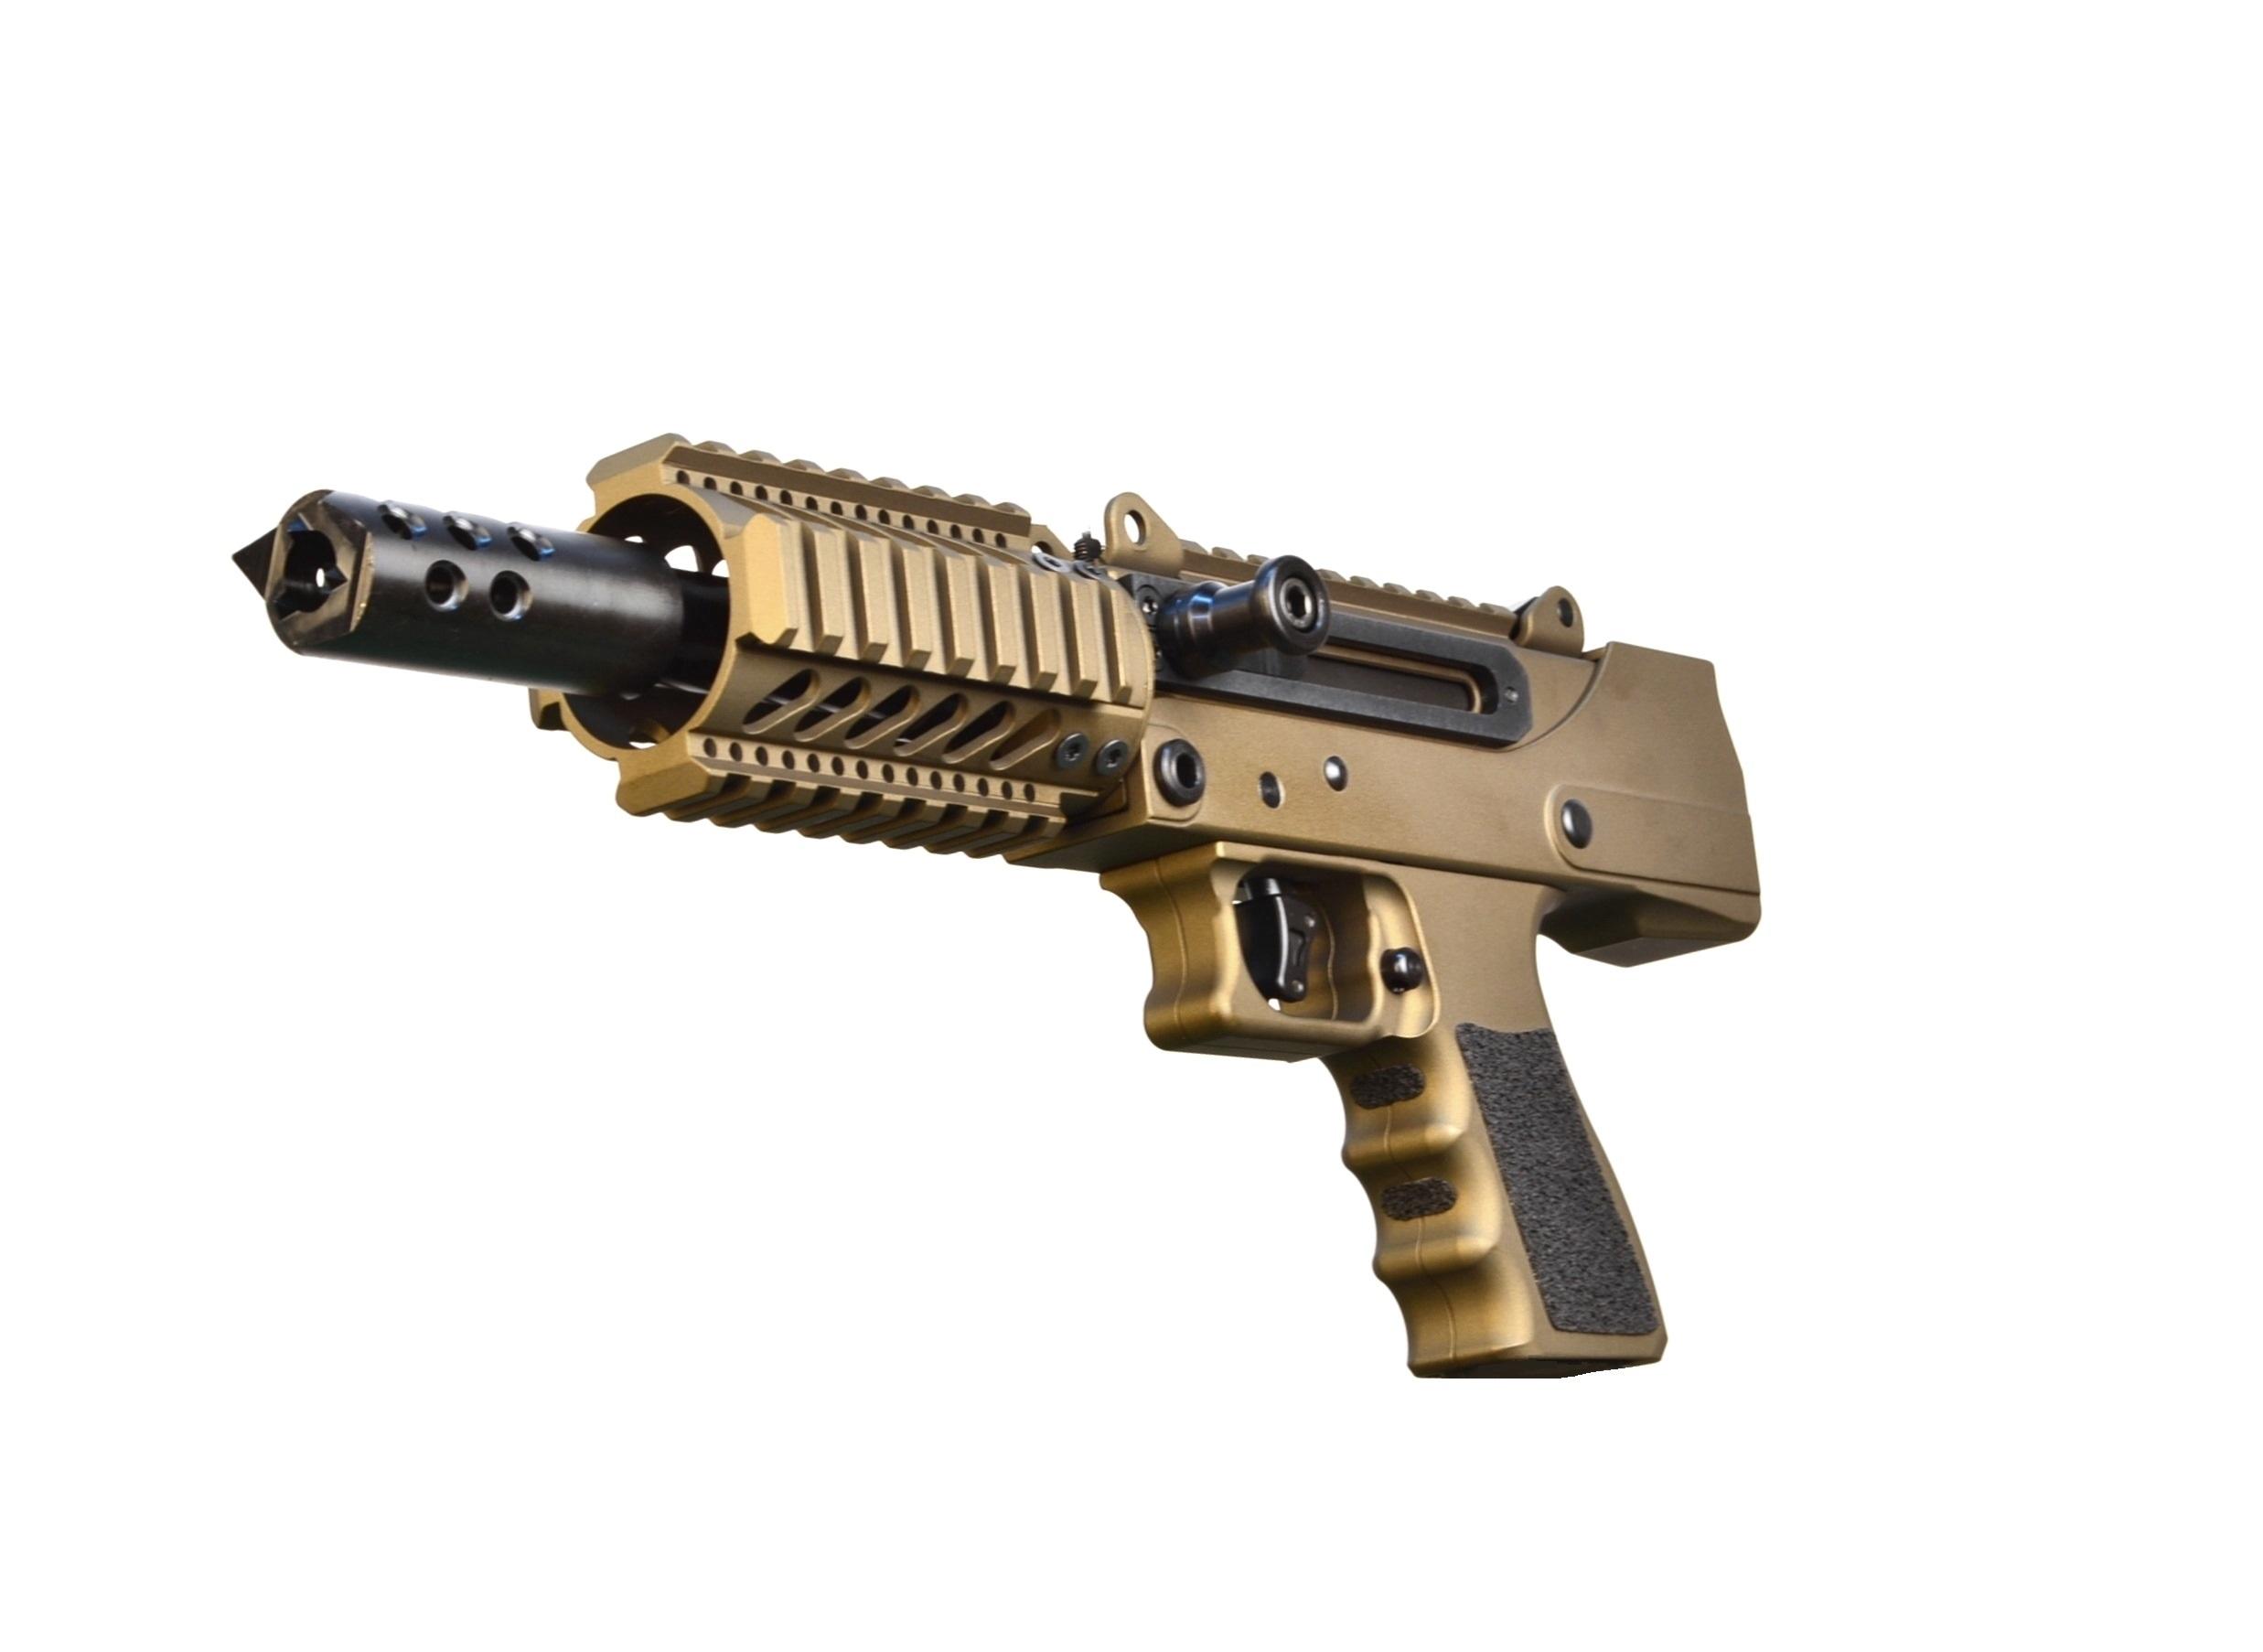 MPA30SST - MasterPiece Arms, Inc.